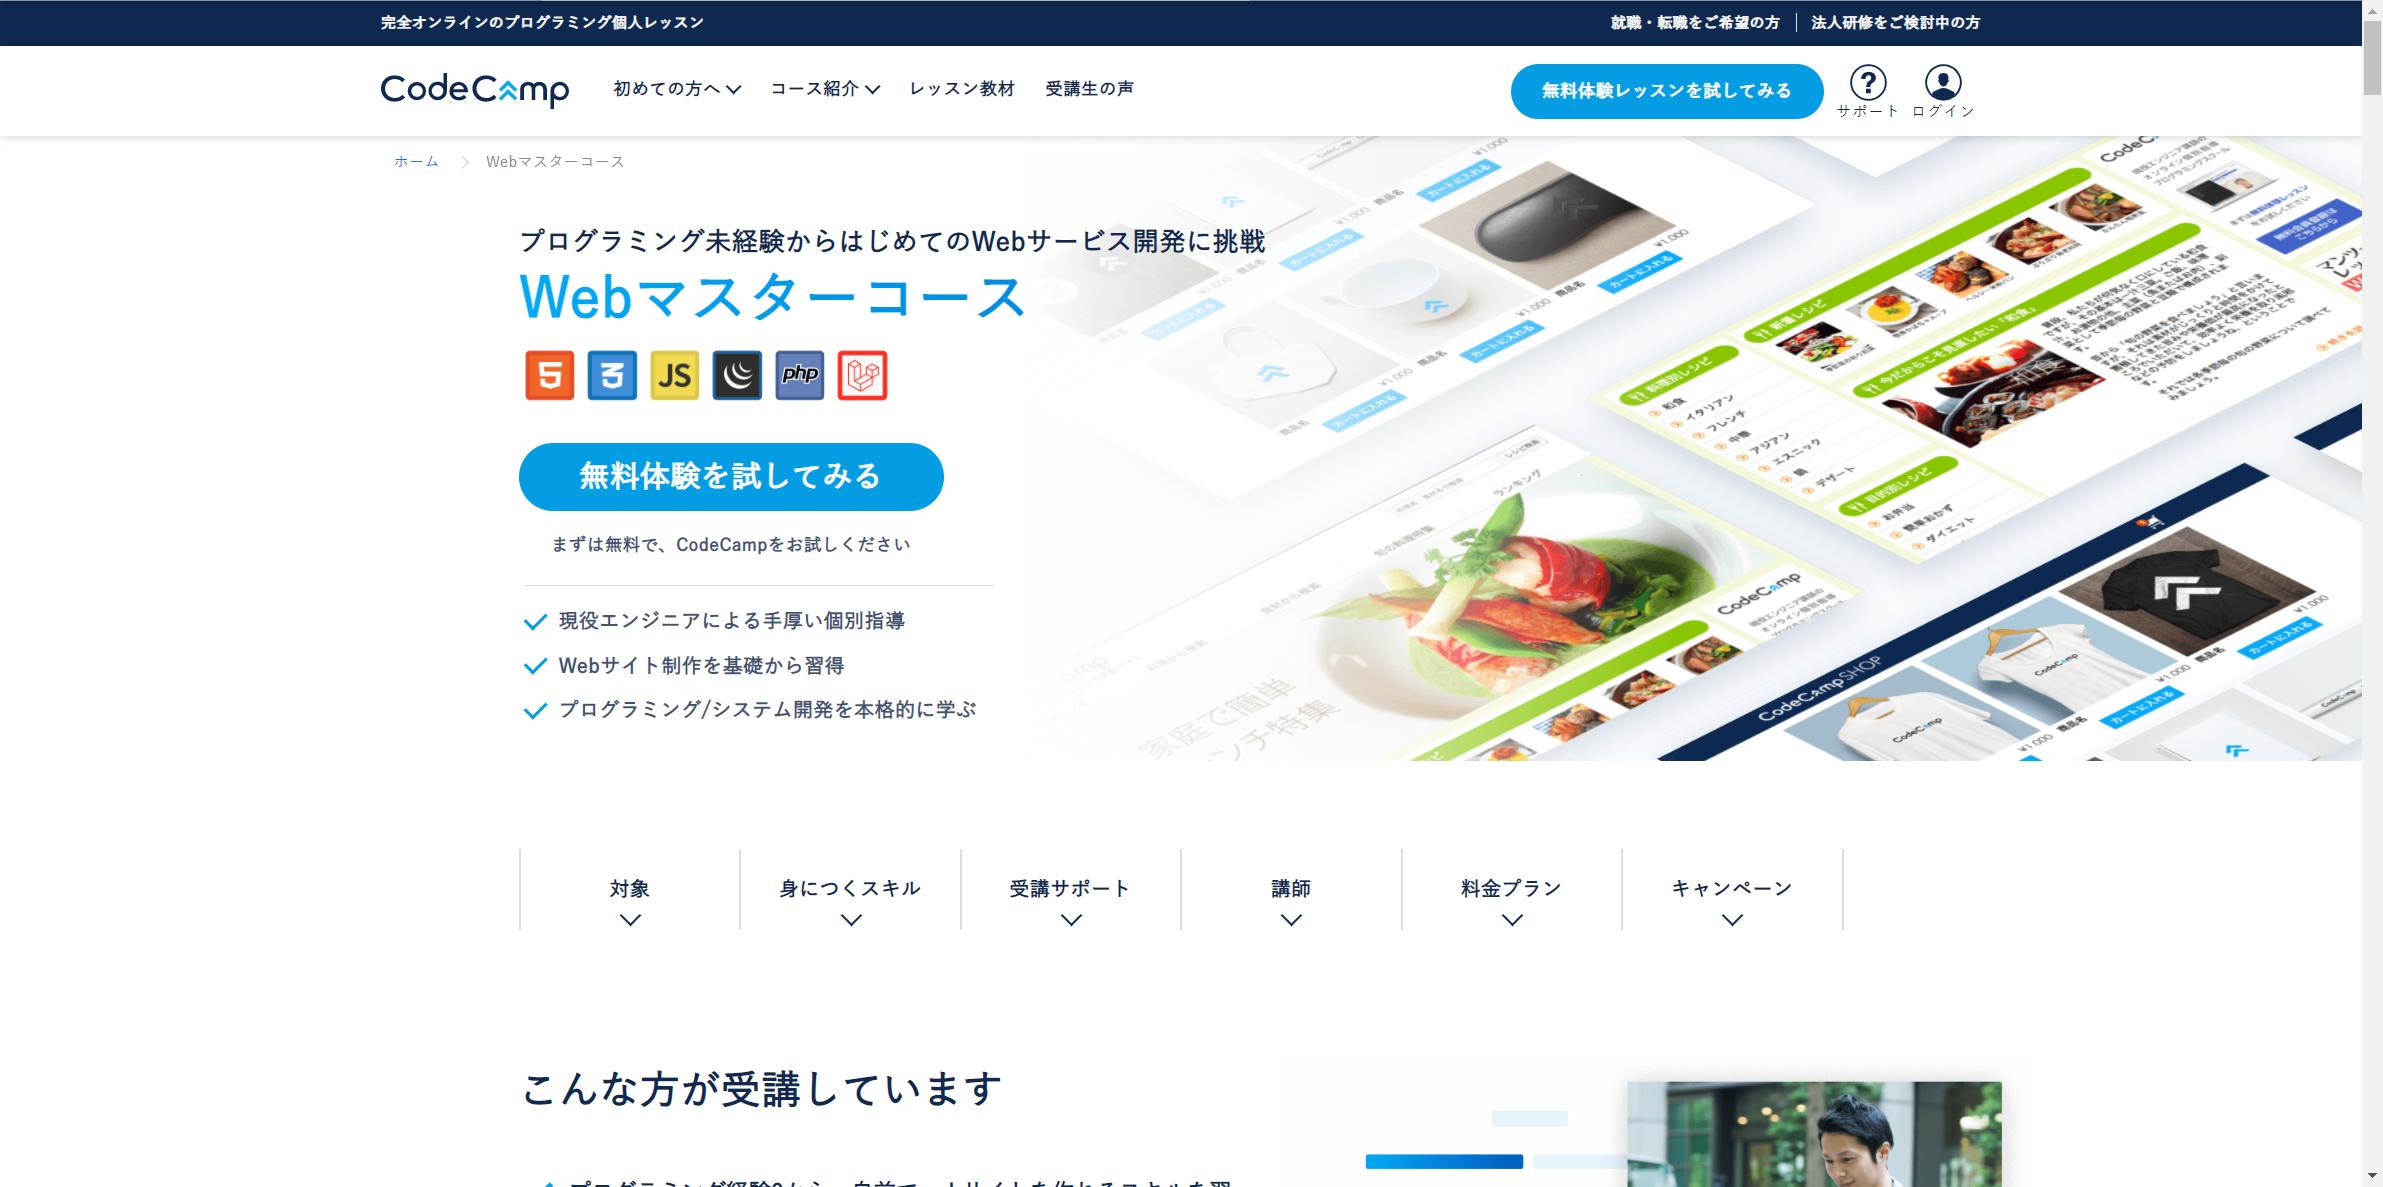 CodeCamp Webマスターコース